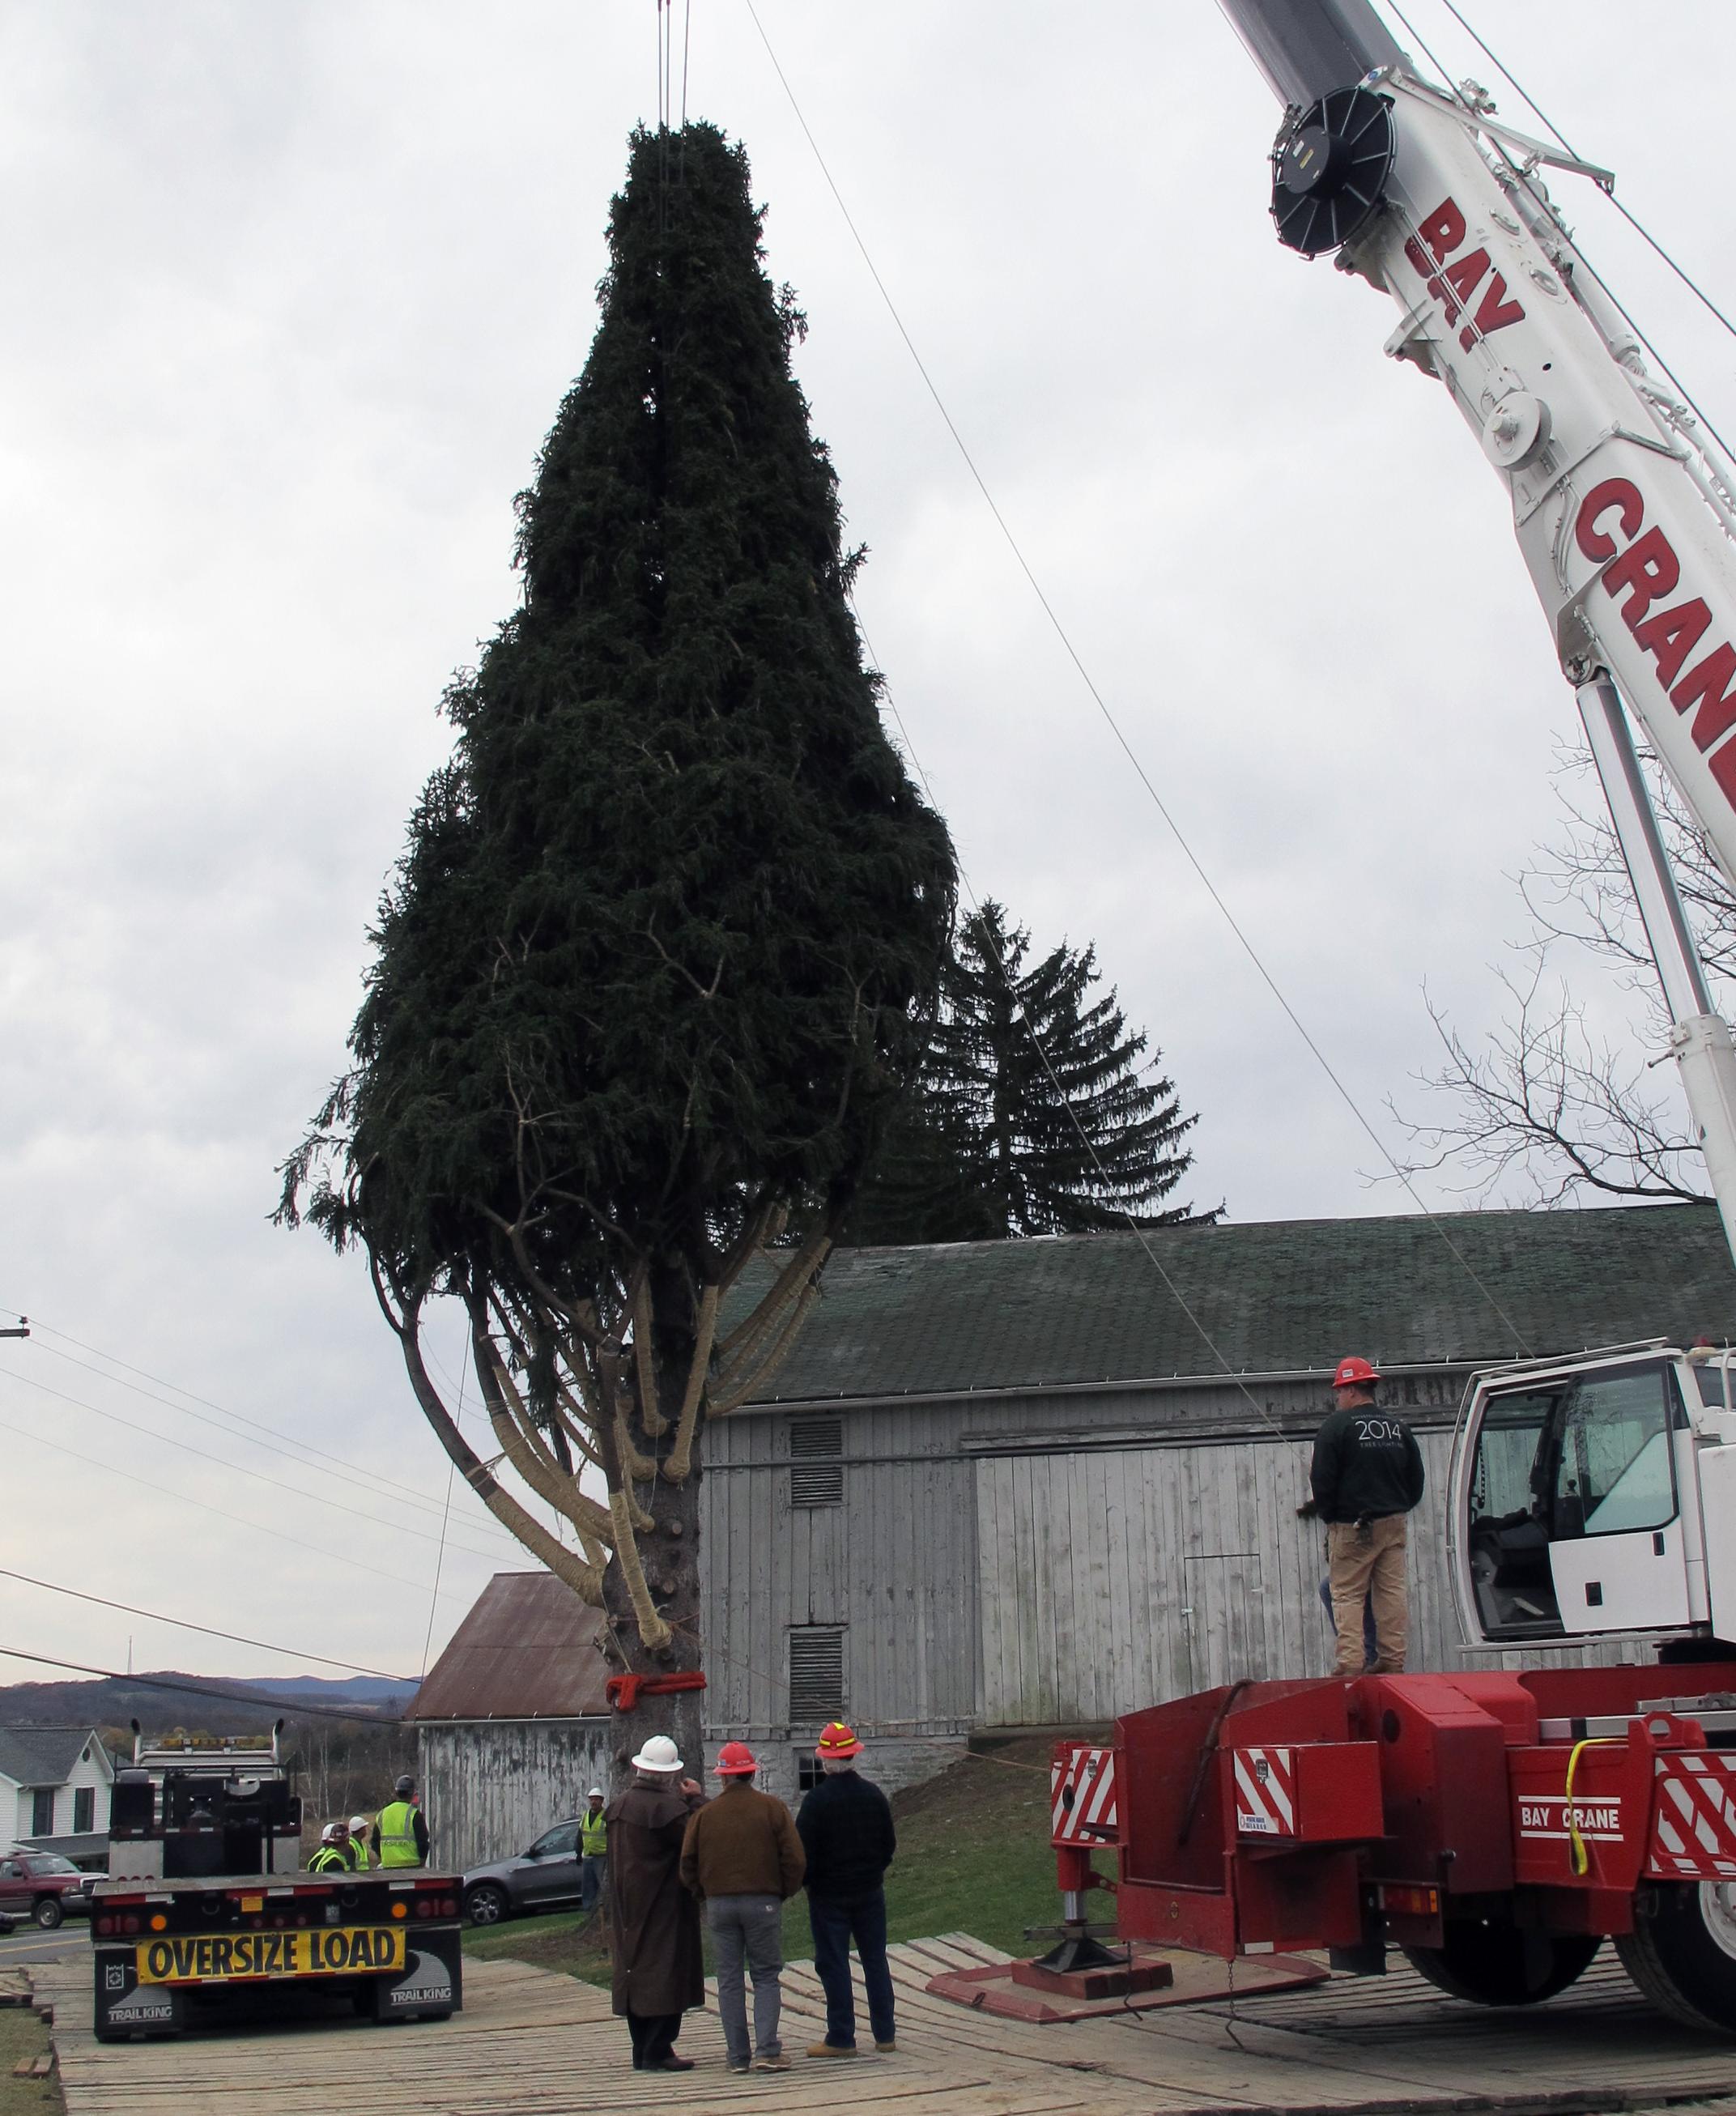 Rockefeller Christmas Tree Lighting 2014: Rockefeller Center Christmas Tree Coming From Pa